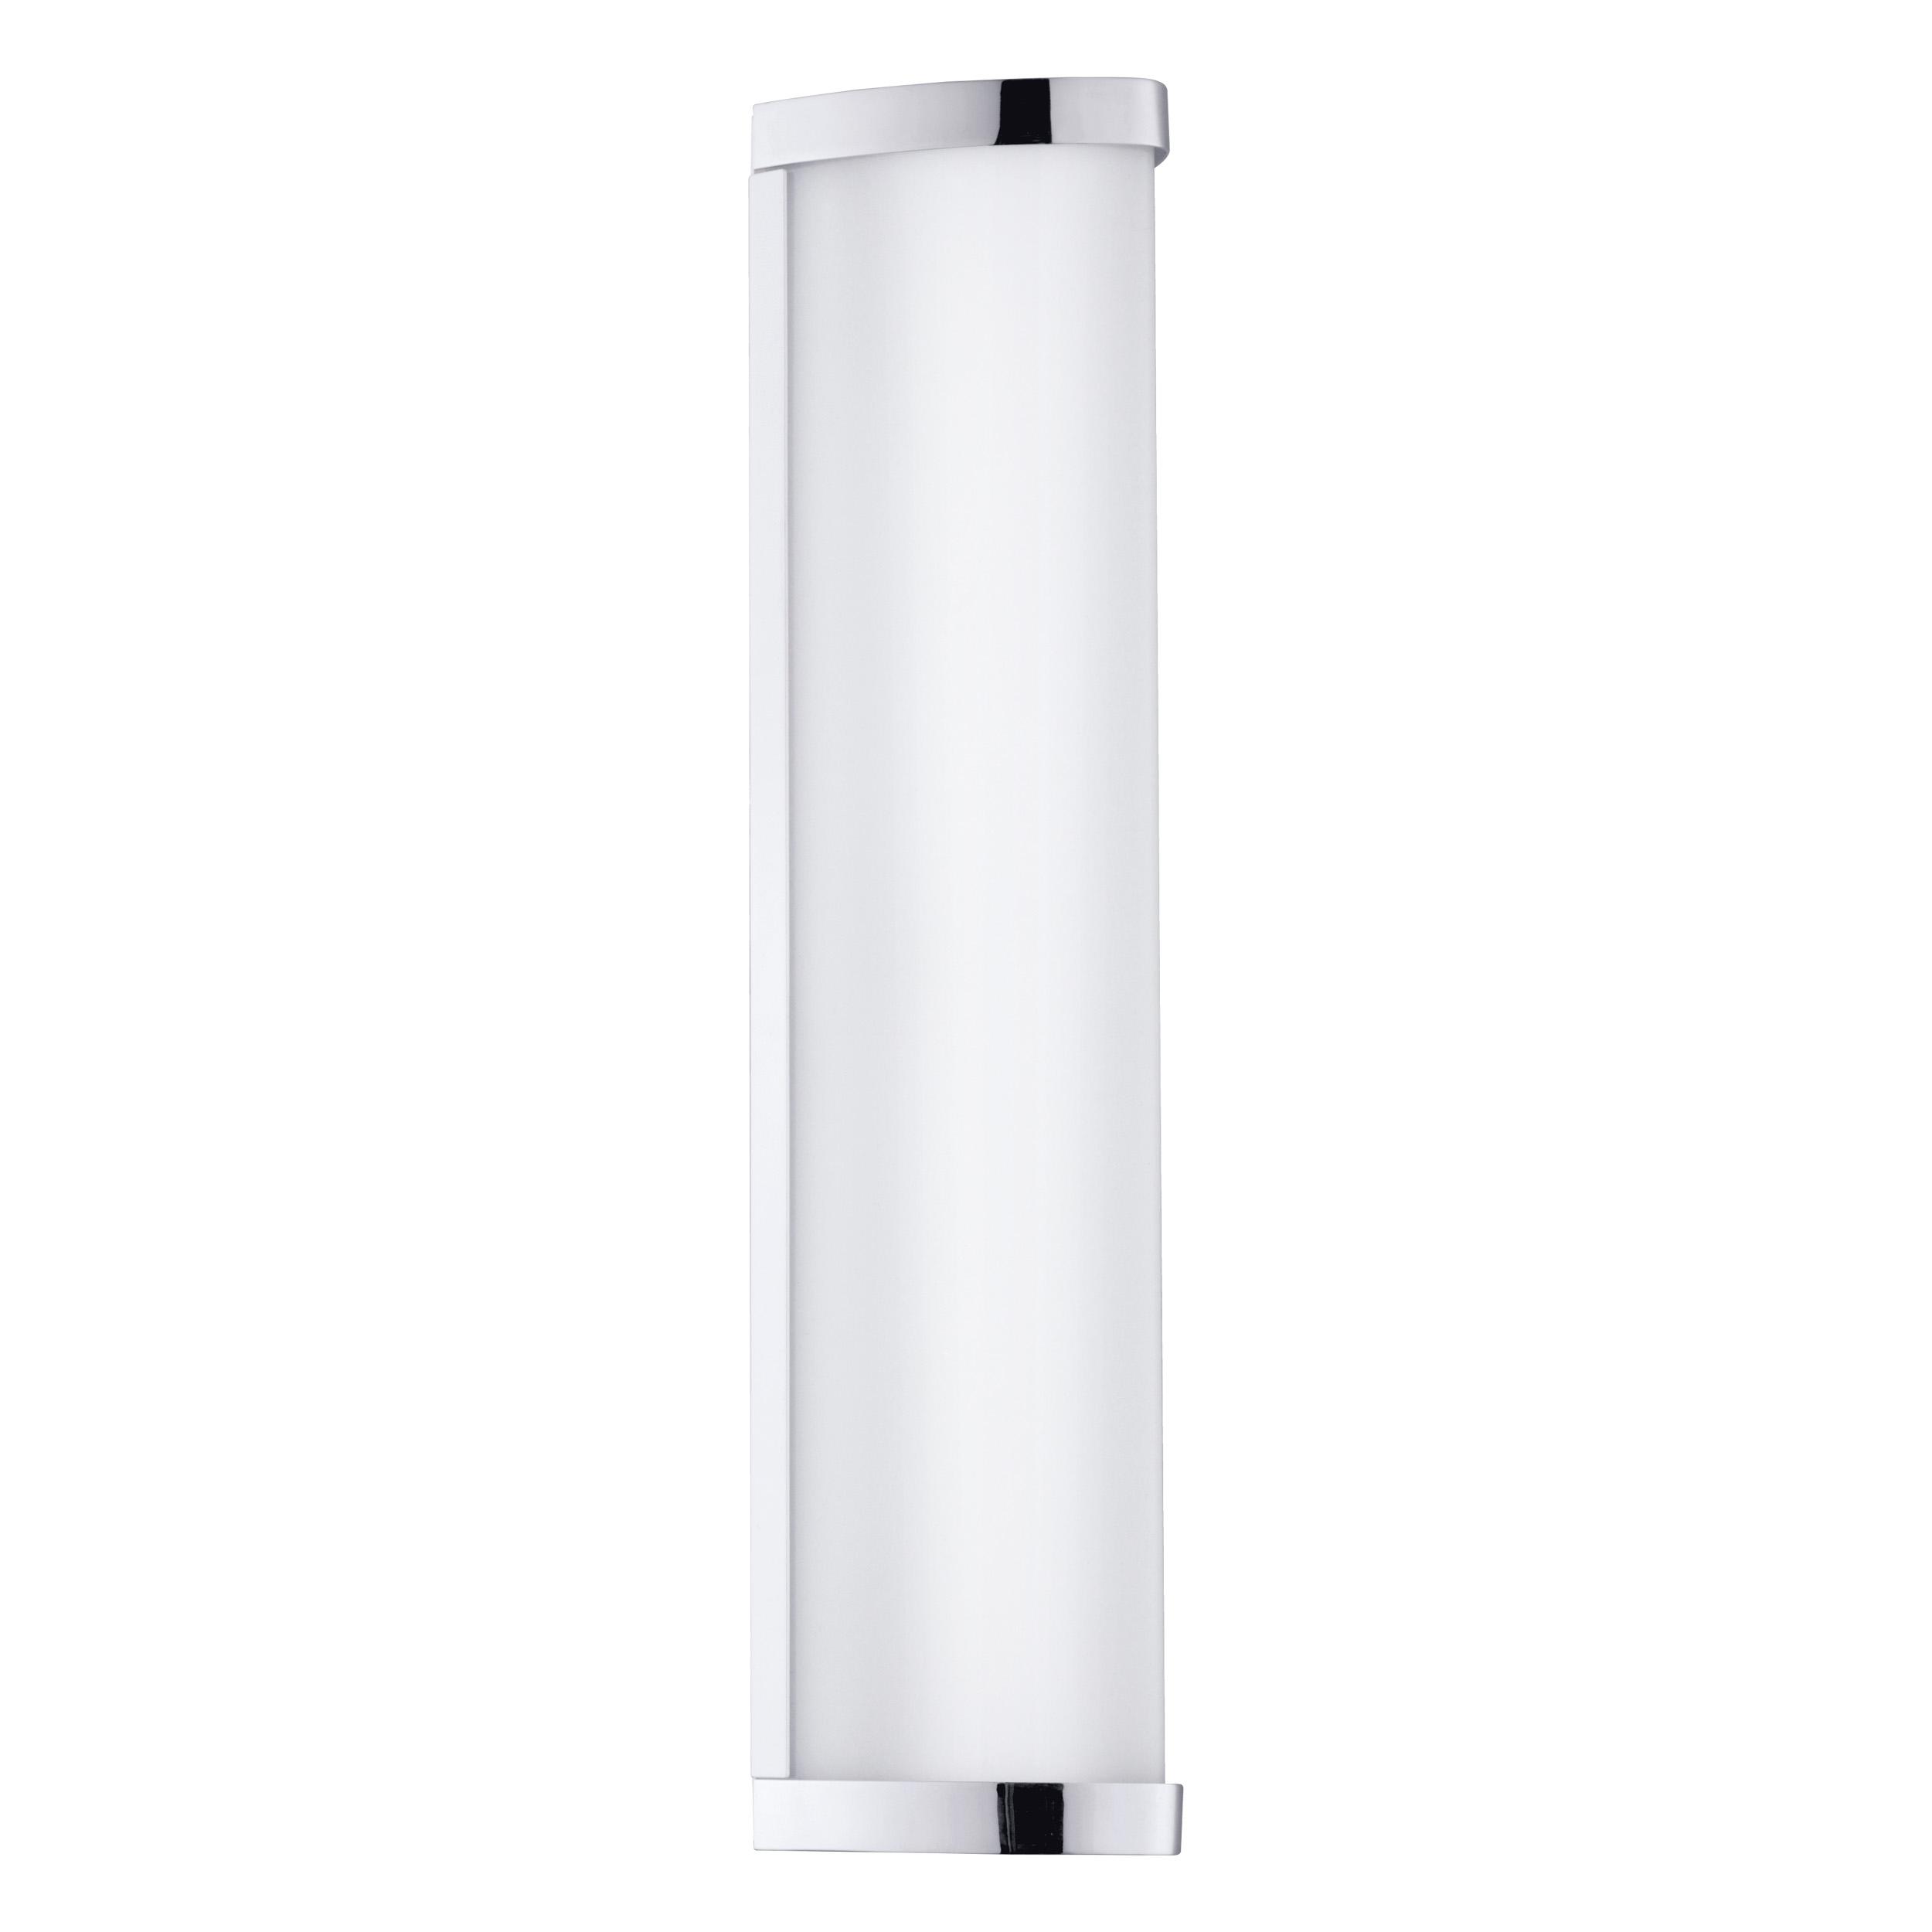 1 Stk LED-Wandleuchte Gita 2 Pro 24,3W 4000K chrom/weiss IP20 LI64046---